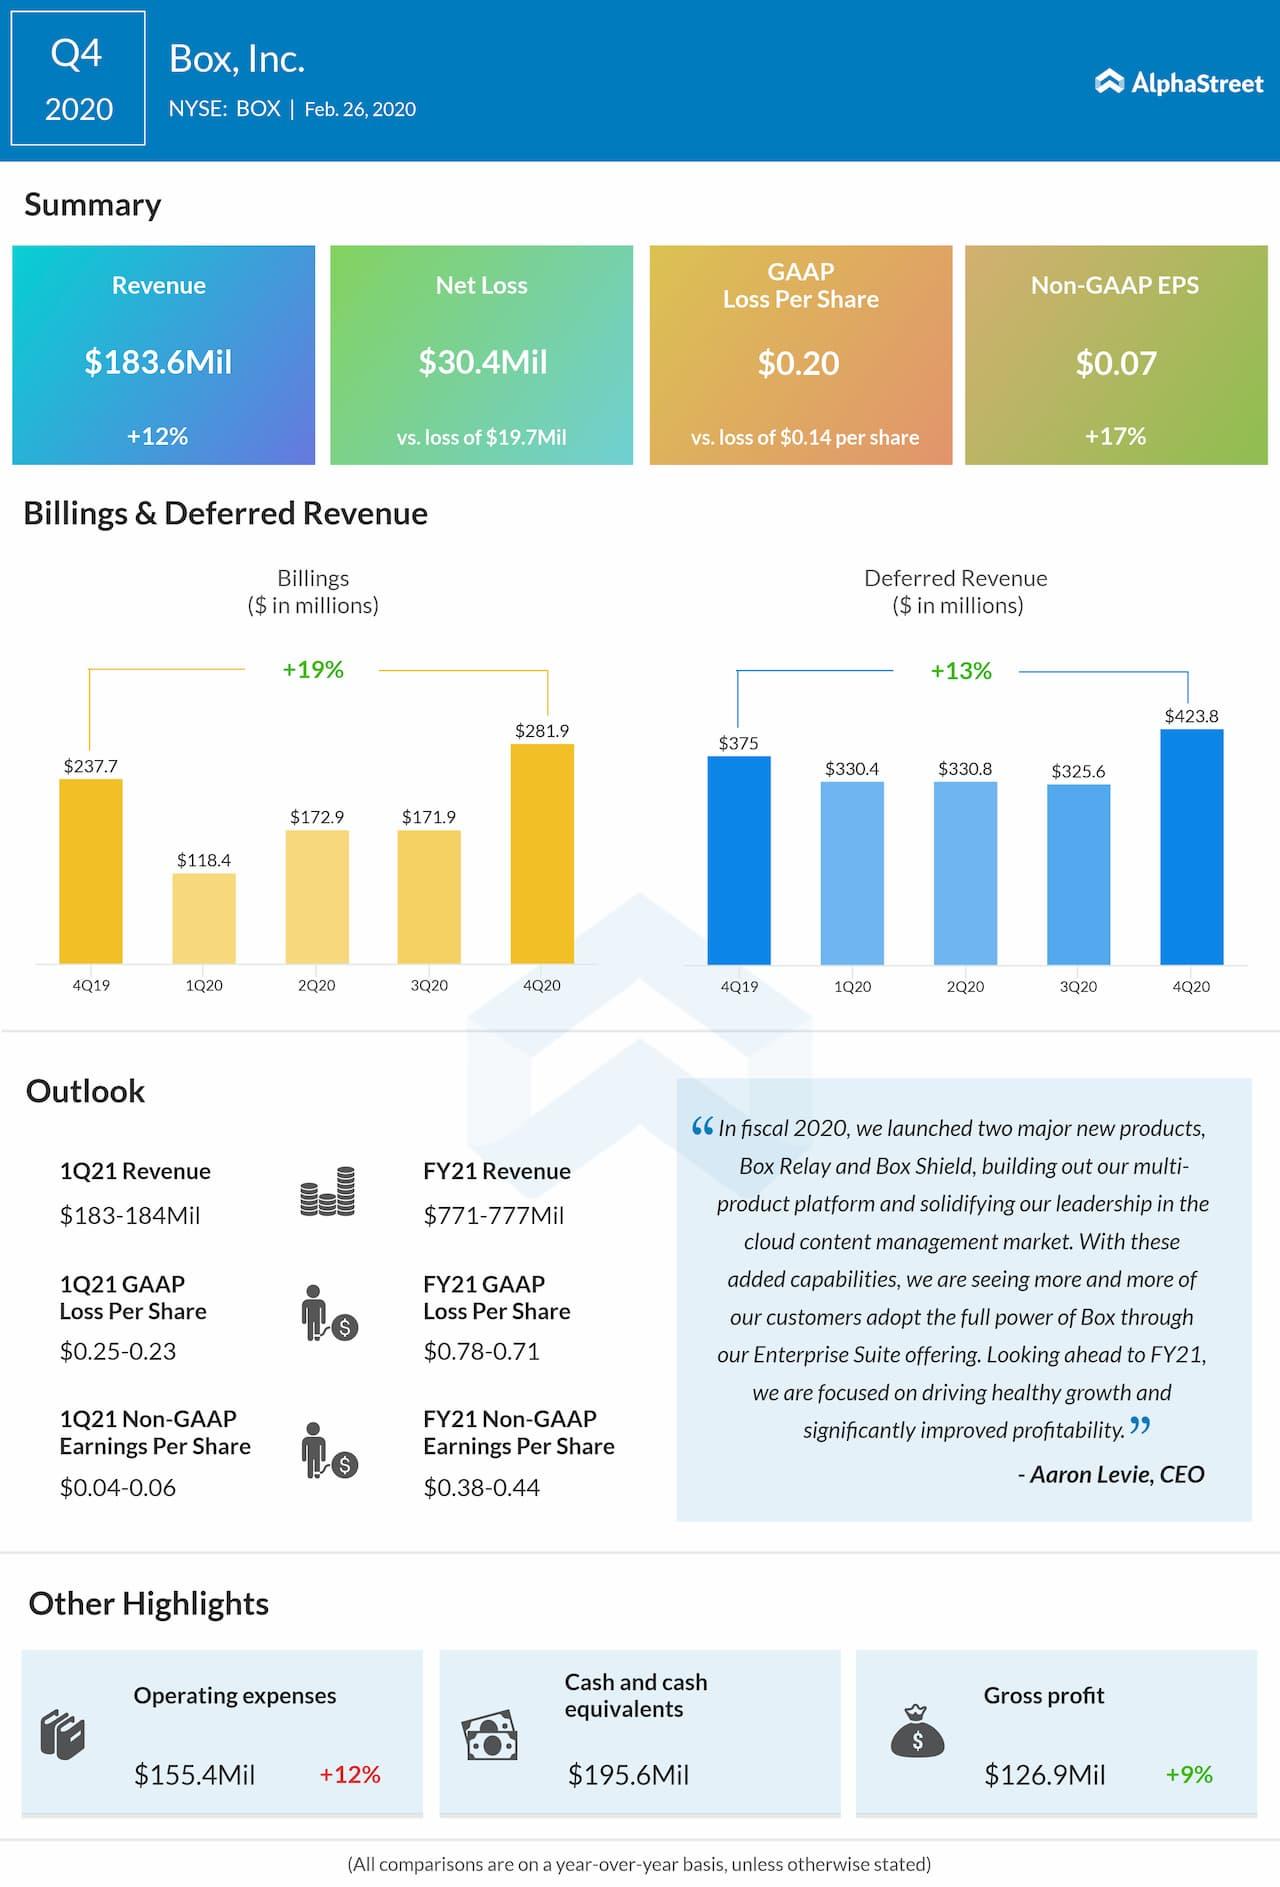 Box Inc. (BOX) Q4 2020 earnings review